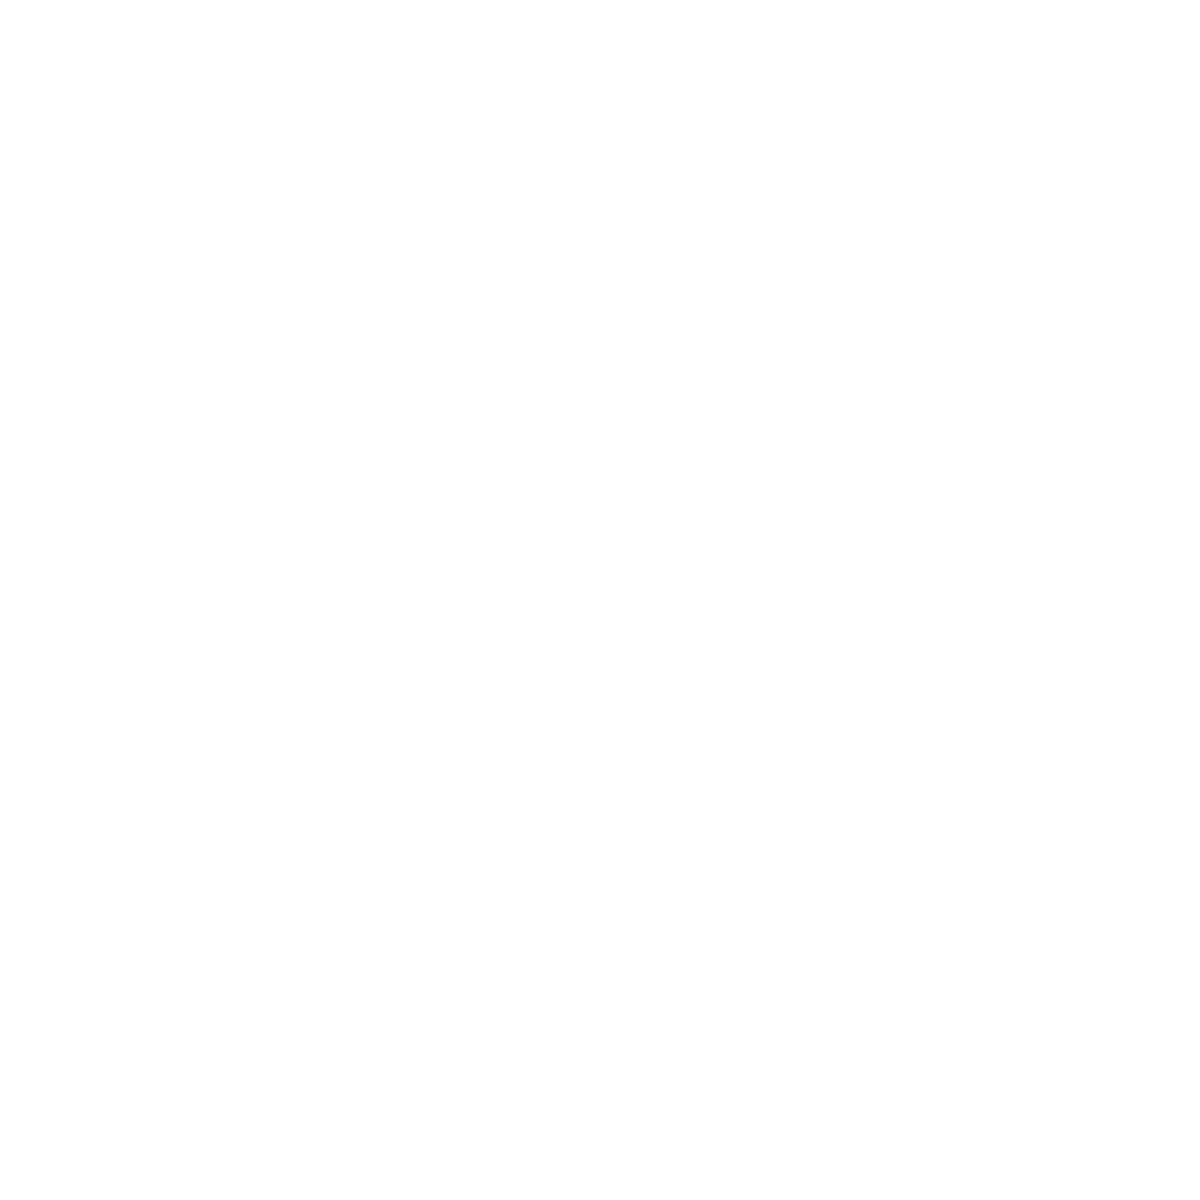 image-Pets.png